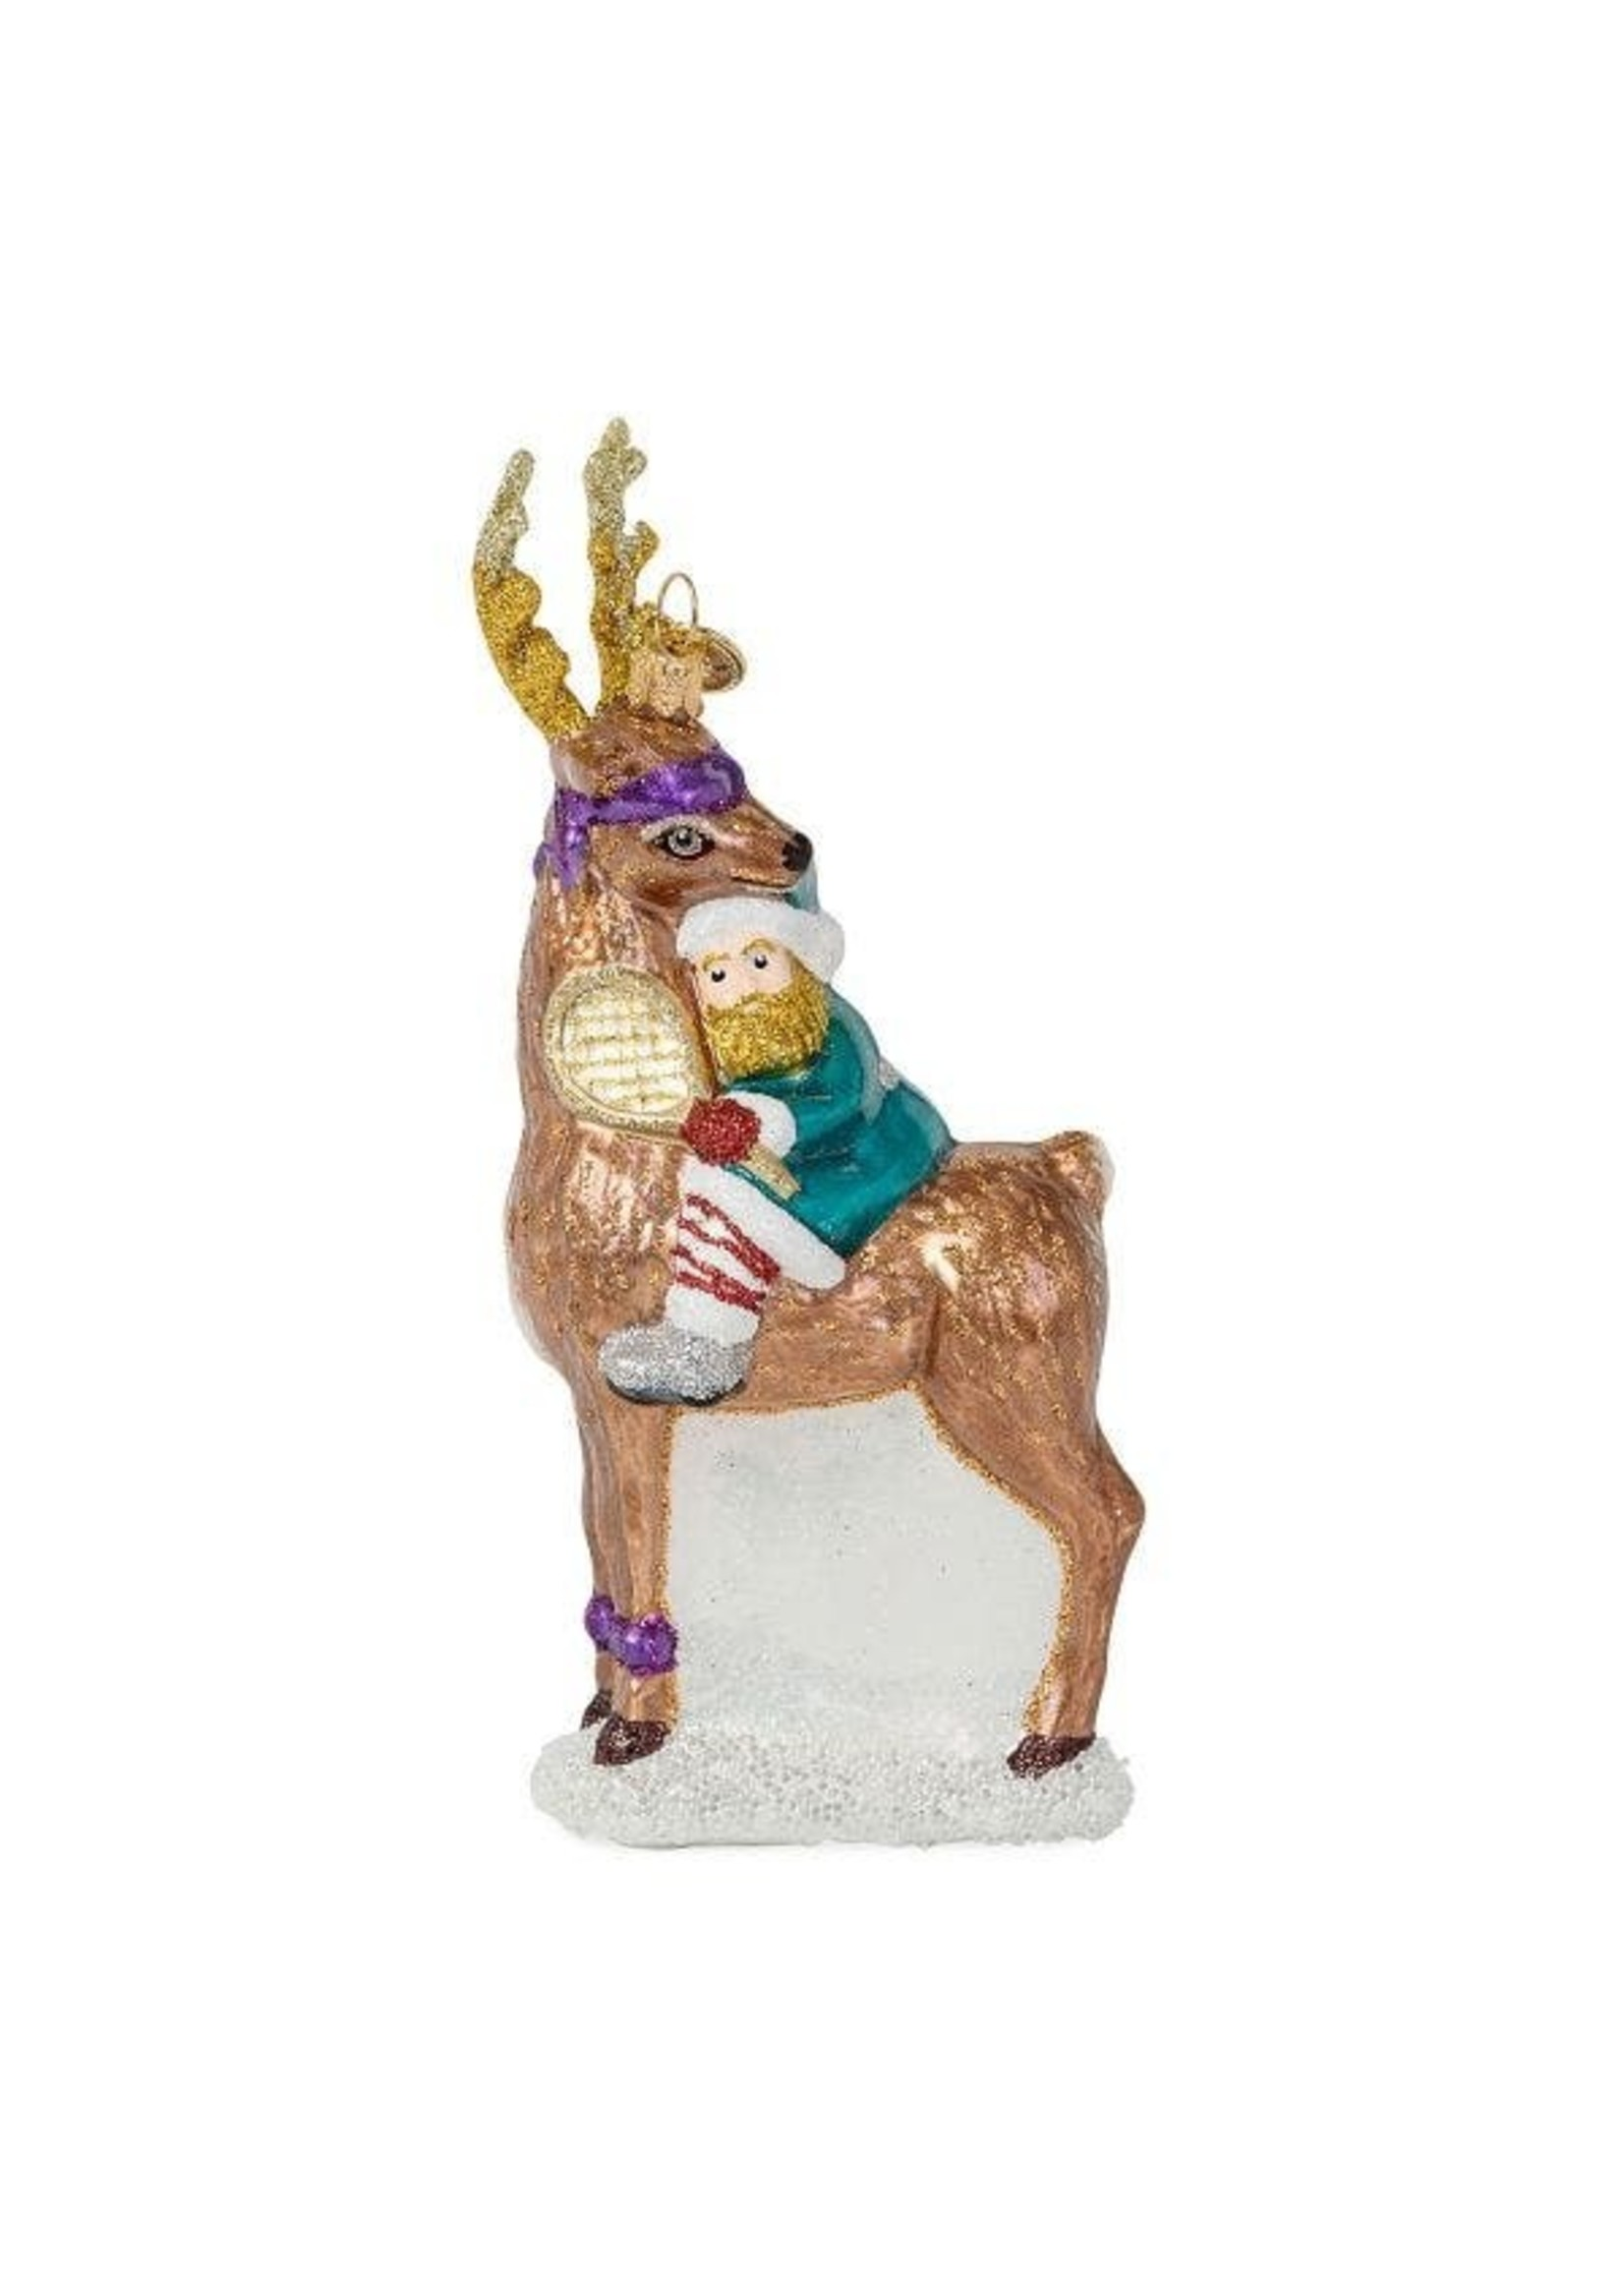 Juliska Ornament - Vixen the Reindeer